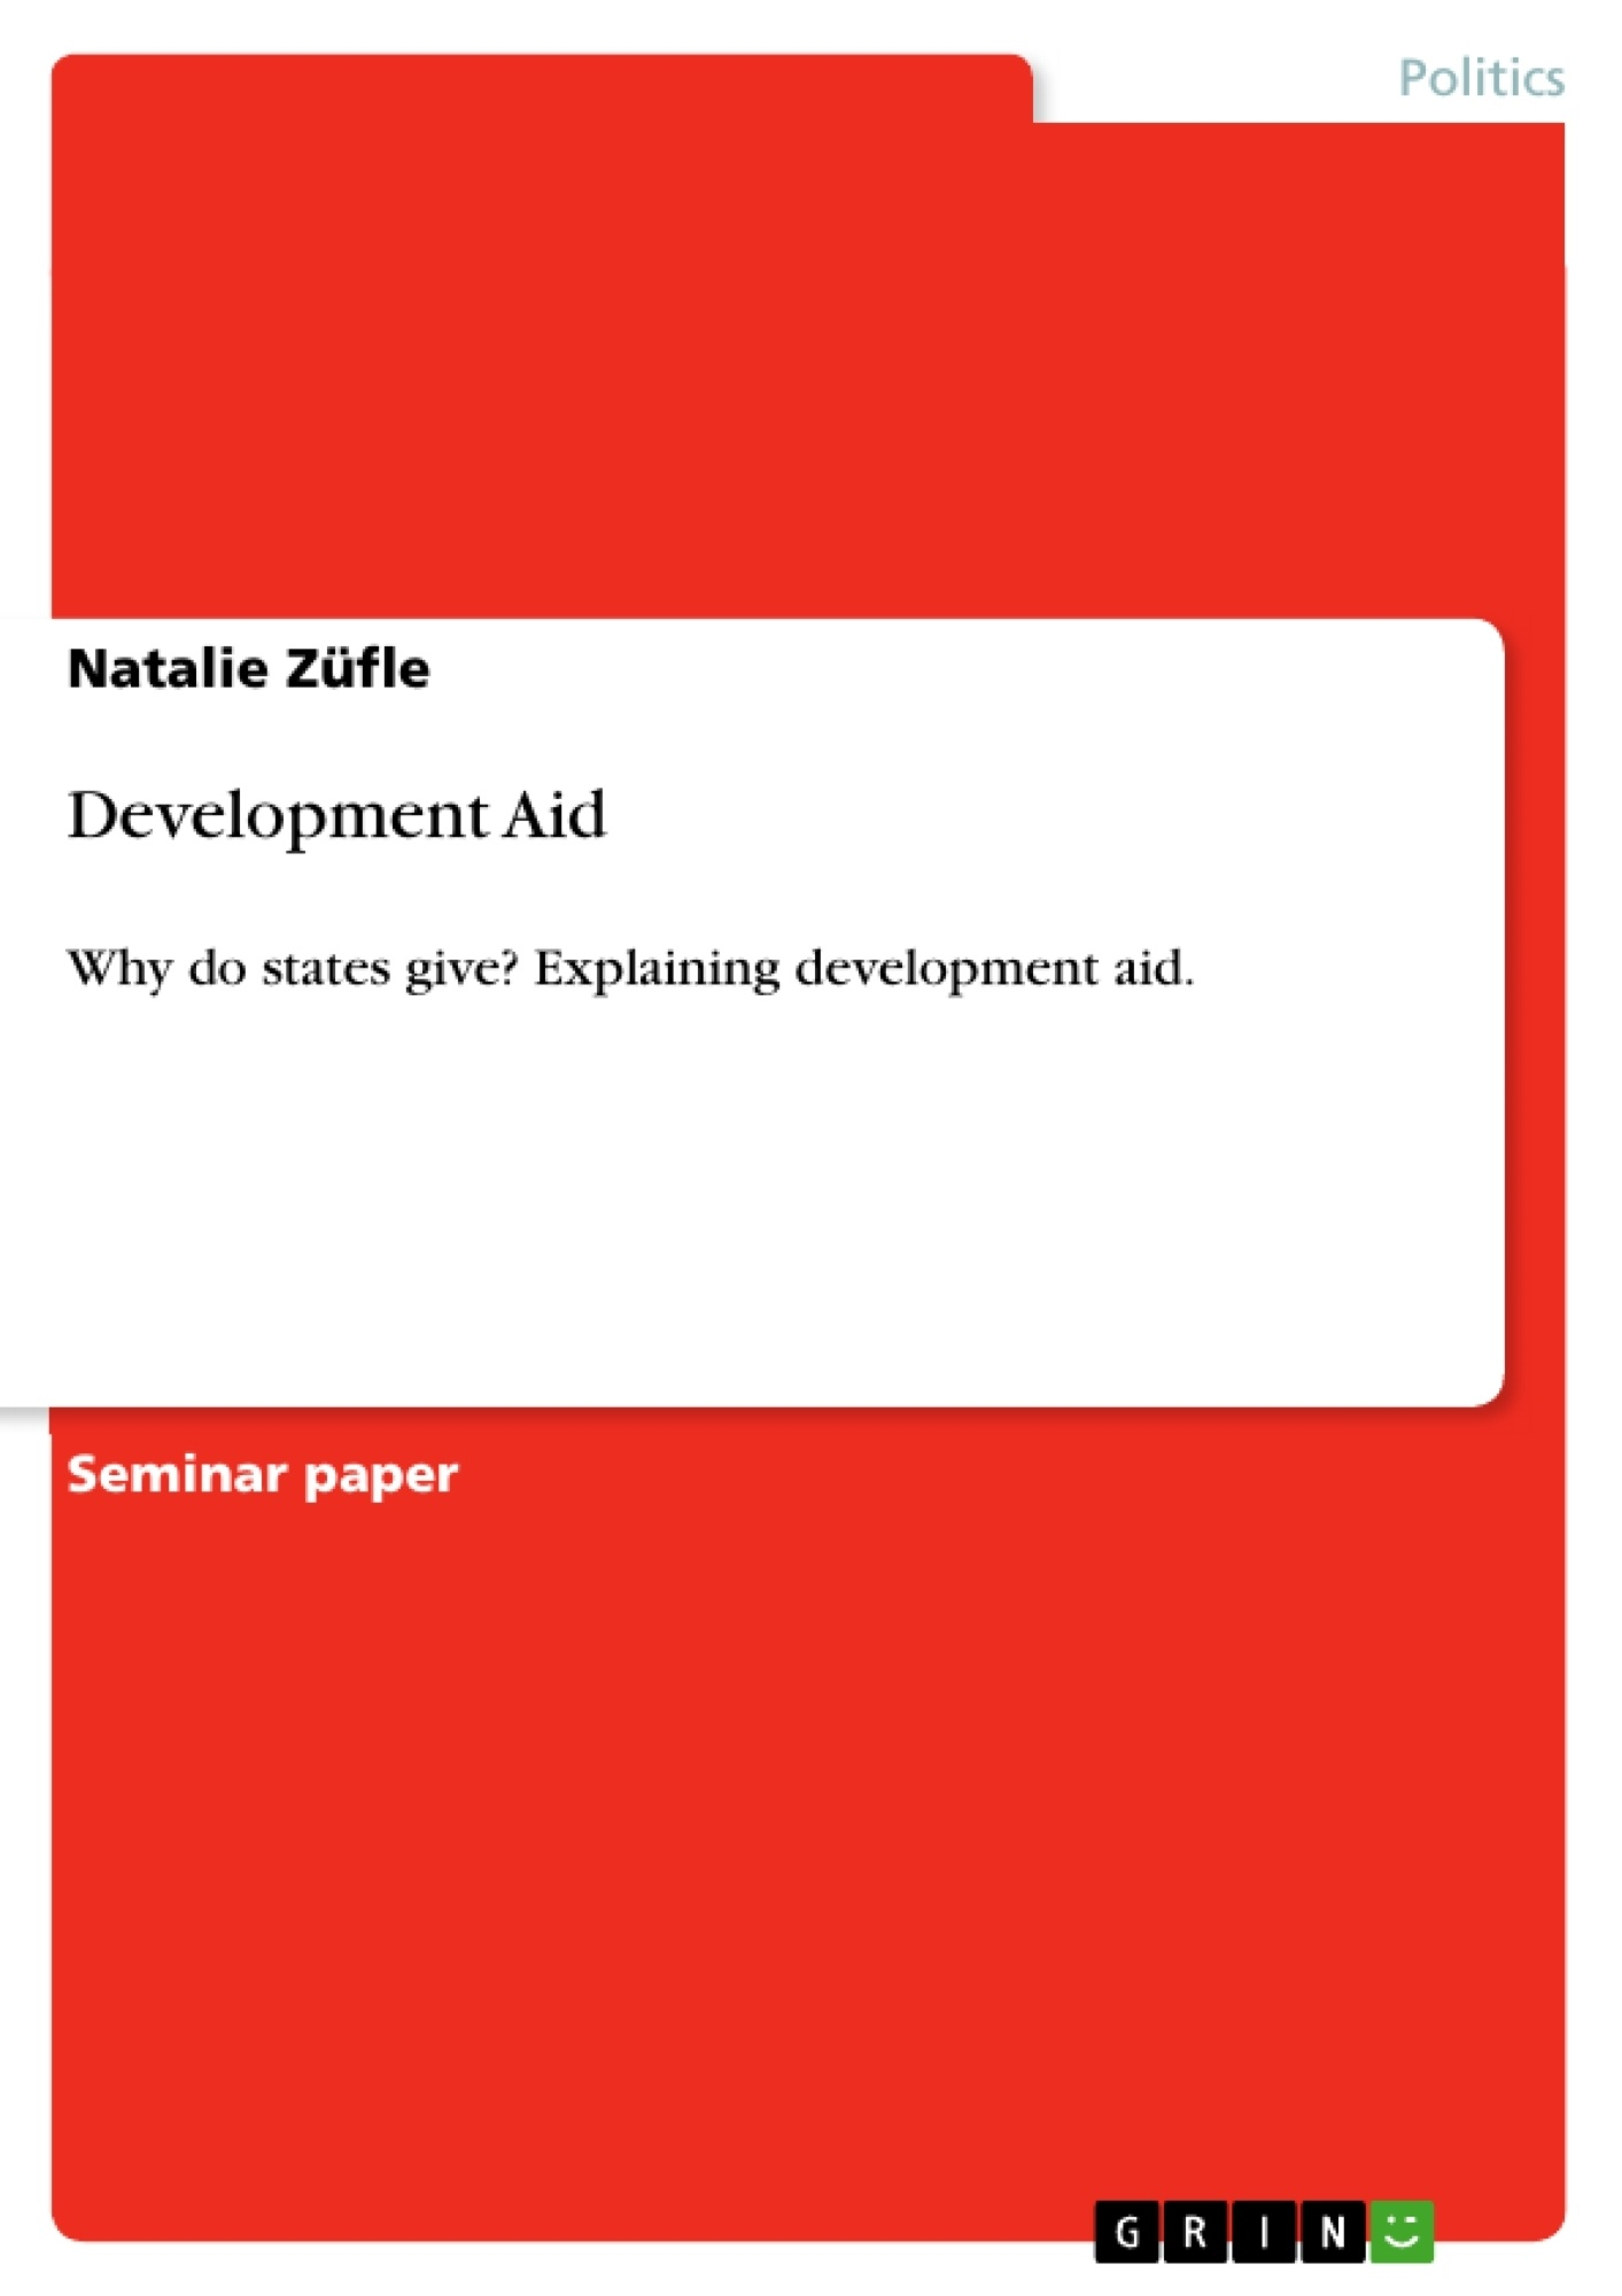 Dissertation entwicklungshilfe